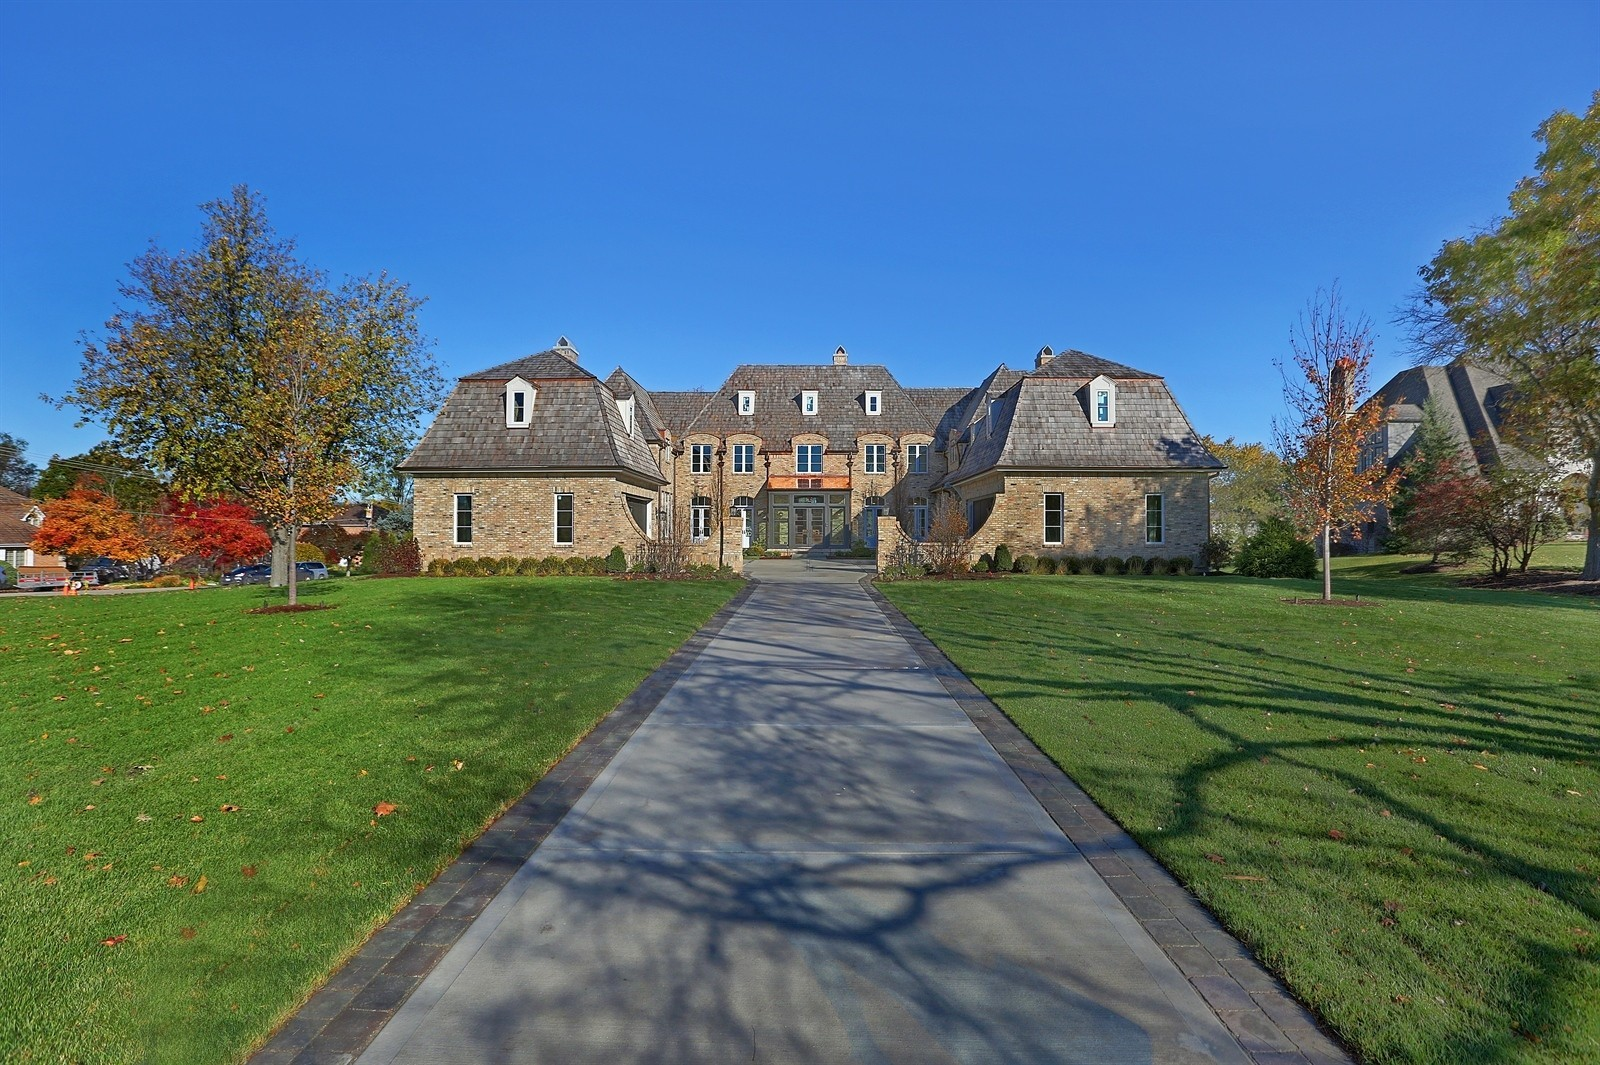 Bulls coach Fred Hoiberg buys Burr Ridge mansion for 39